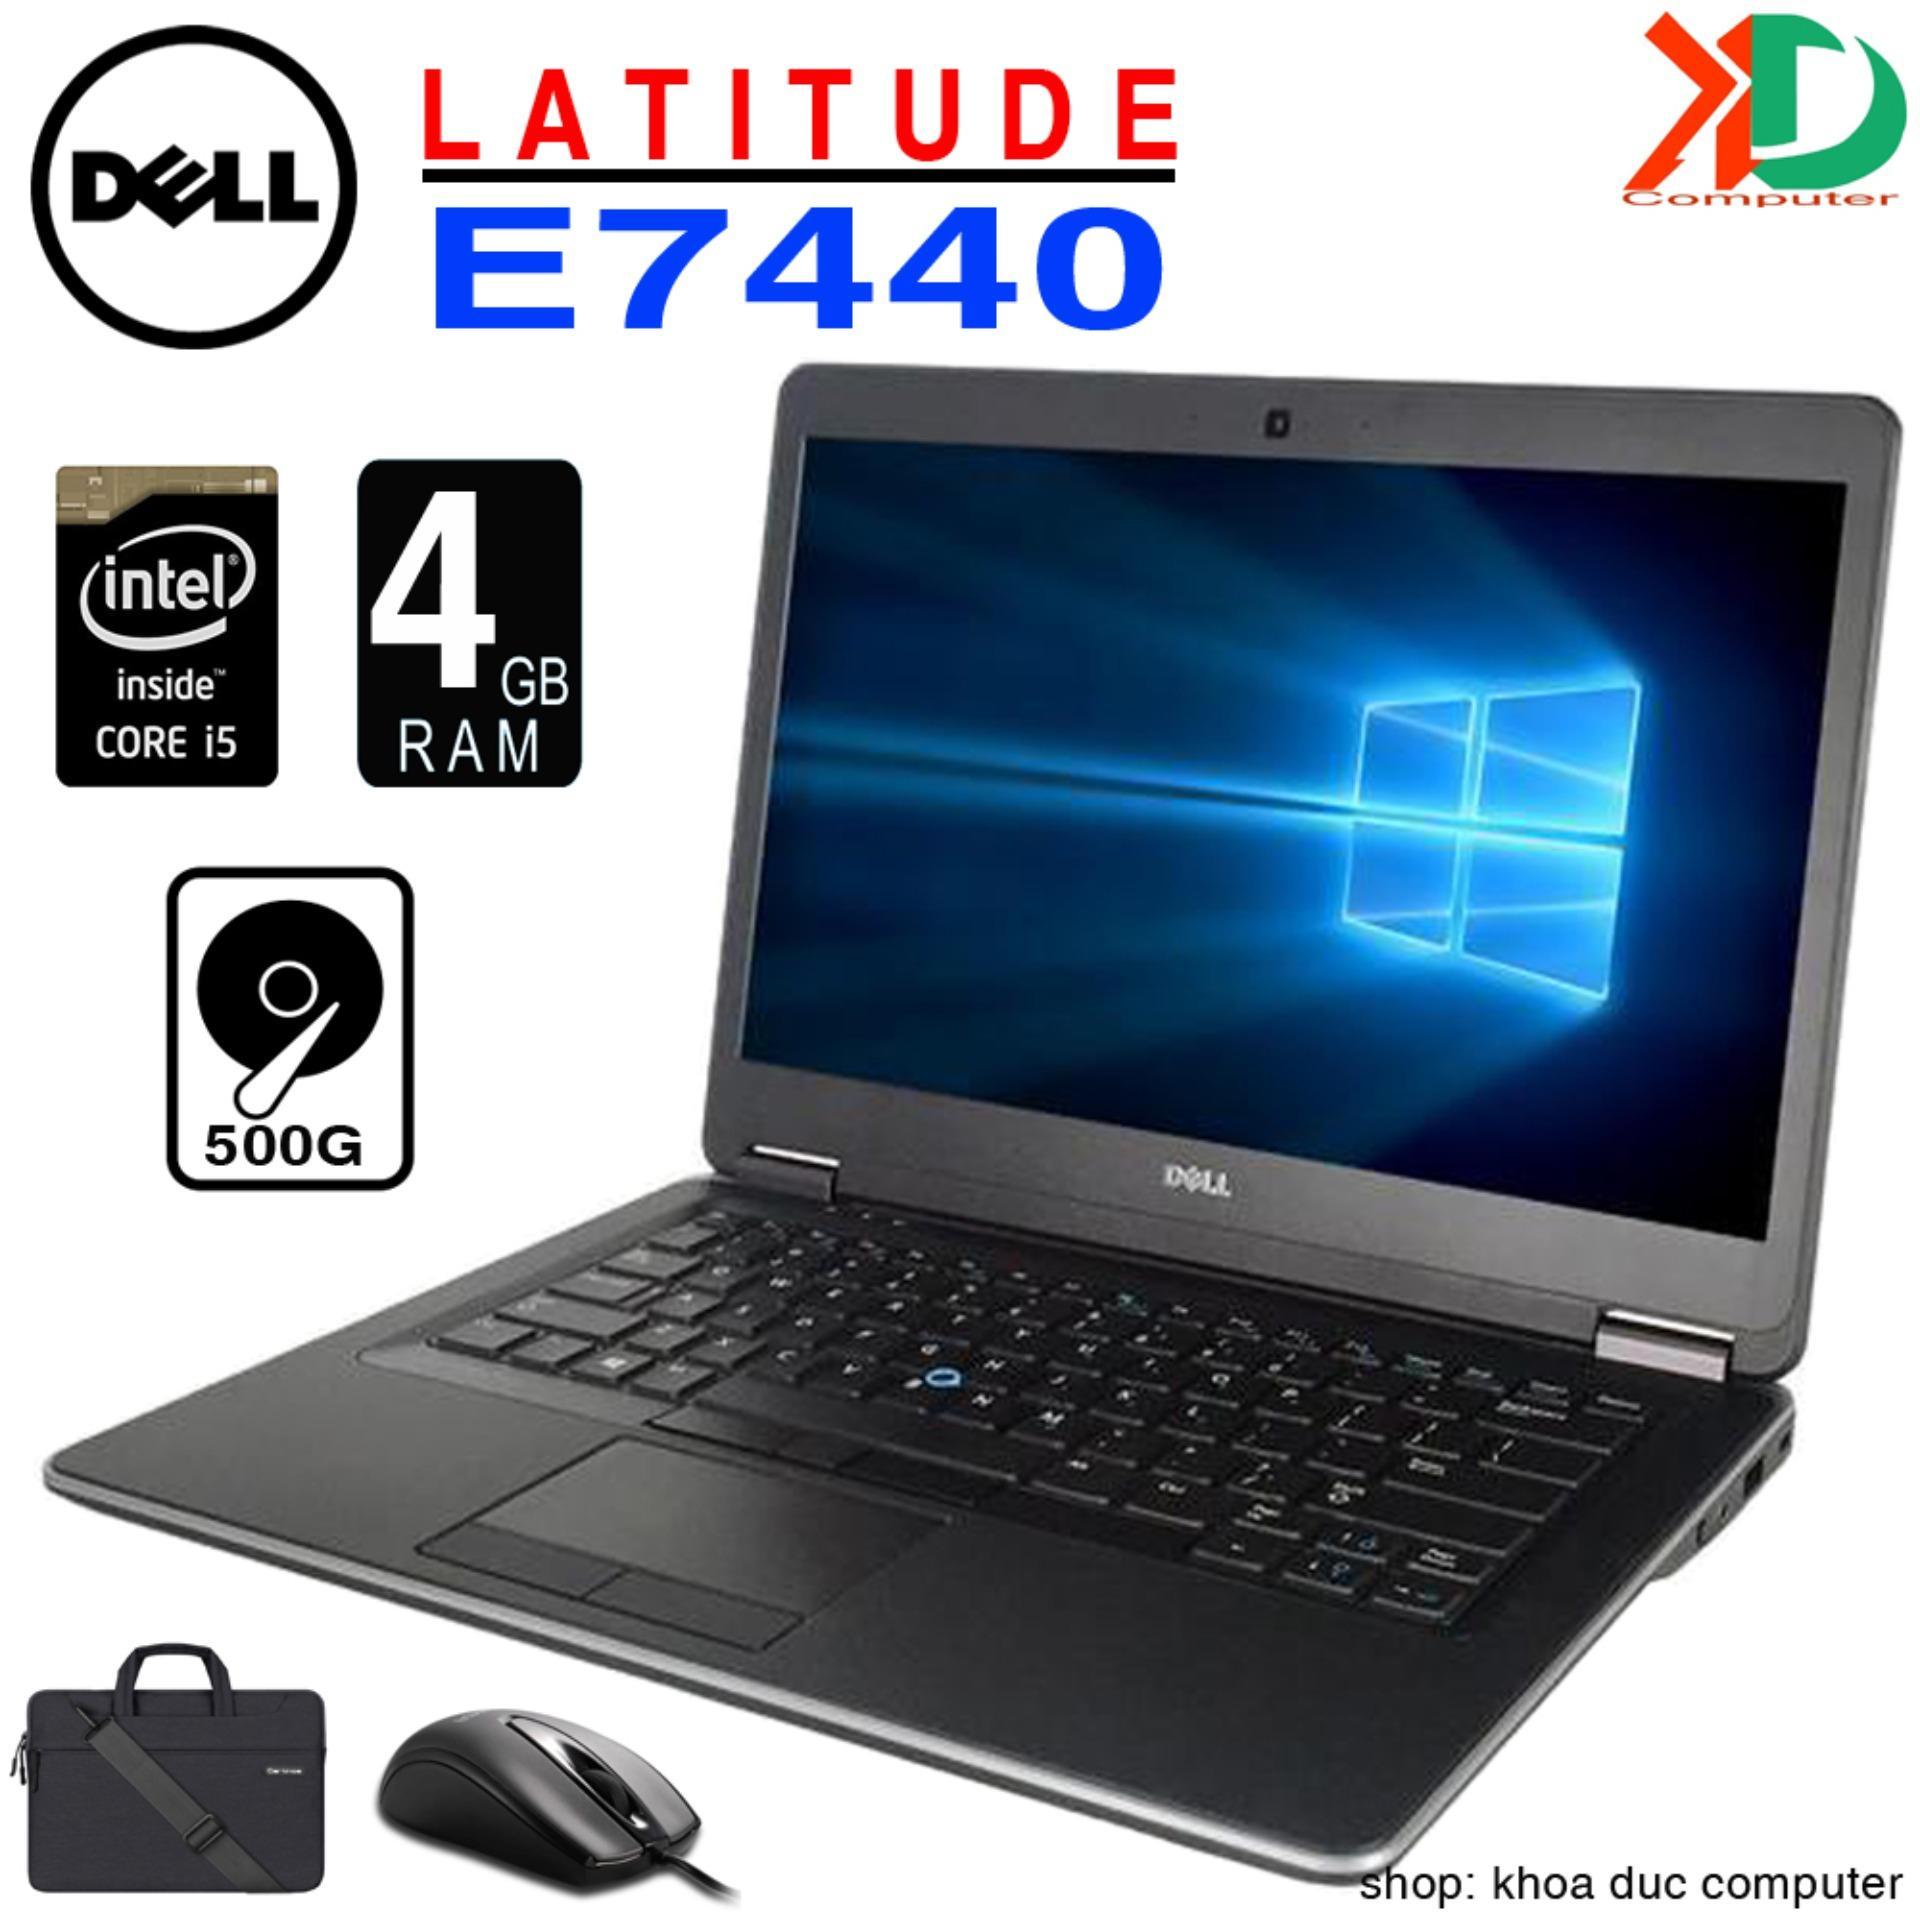 Laptop DELL Latitude E7440 - Core i5-4300U/ 4gb RAM/ 500gb HDD 14inch HD nhập khẩu, tặng Túi, Chuột